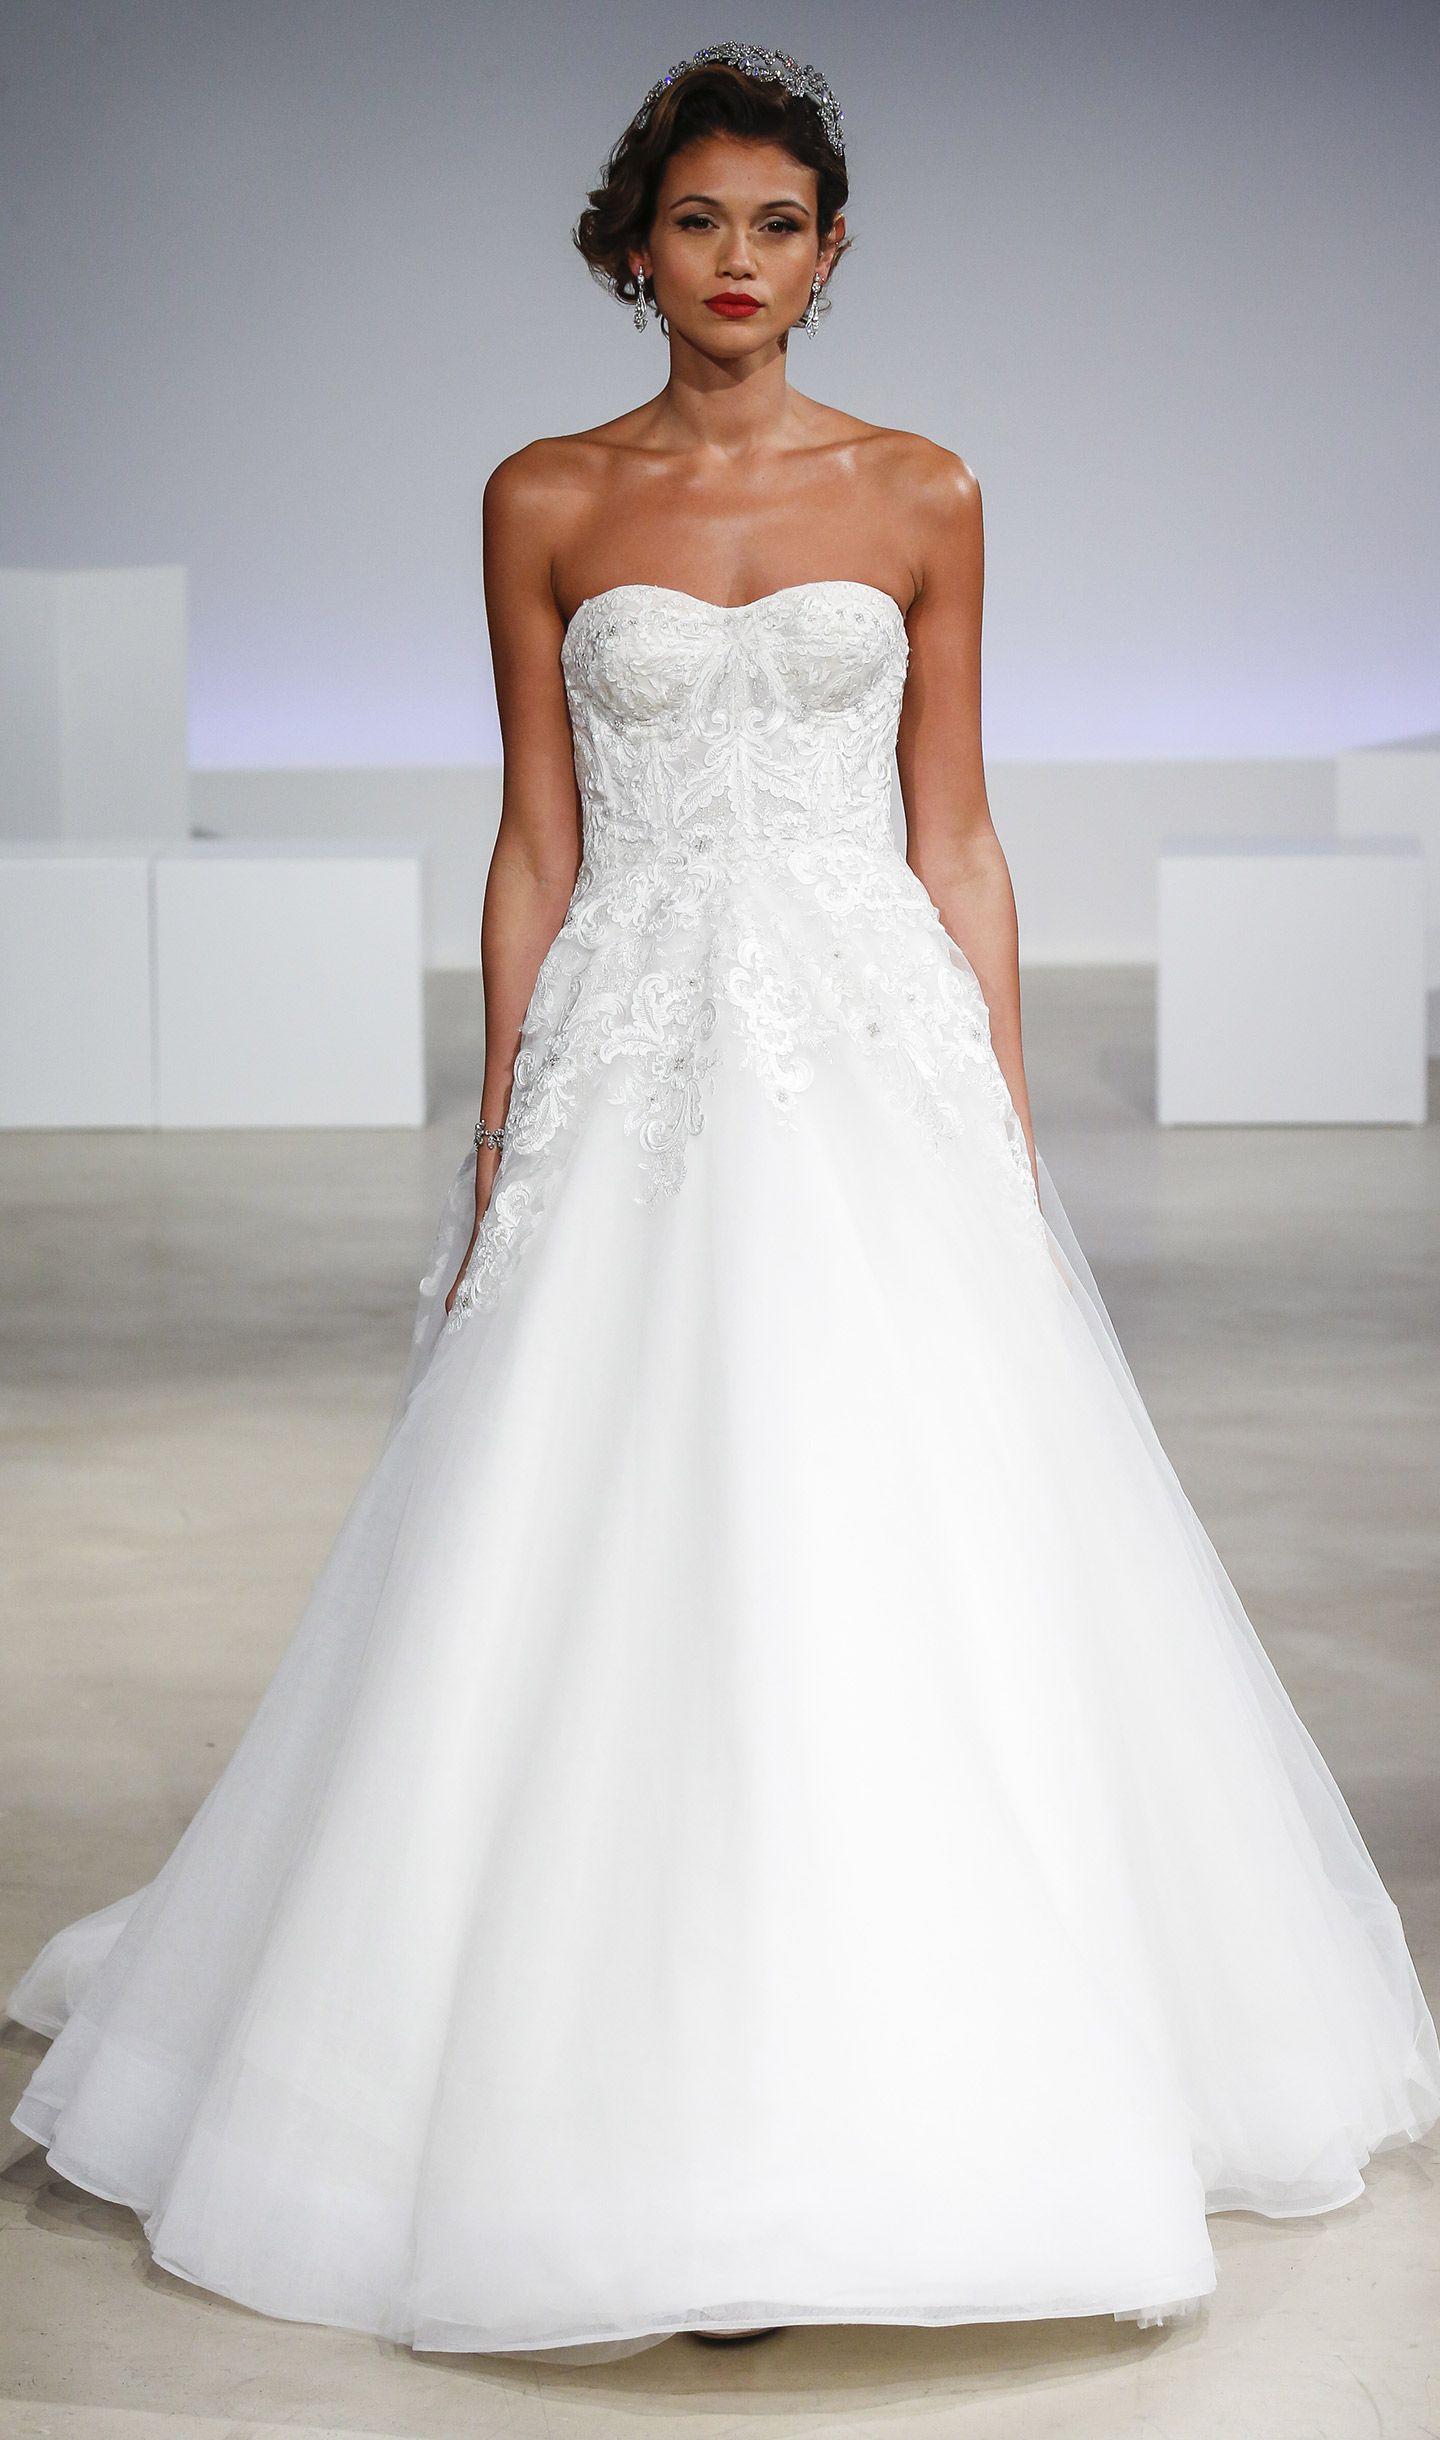 Simple Ball Gown Wedding Dress on Kleinfeld Bridal